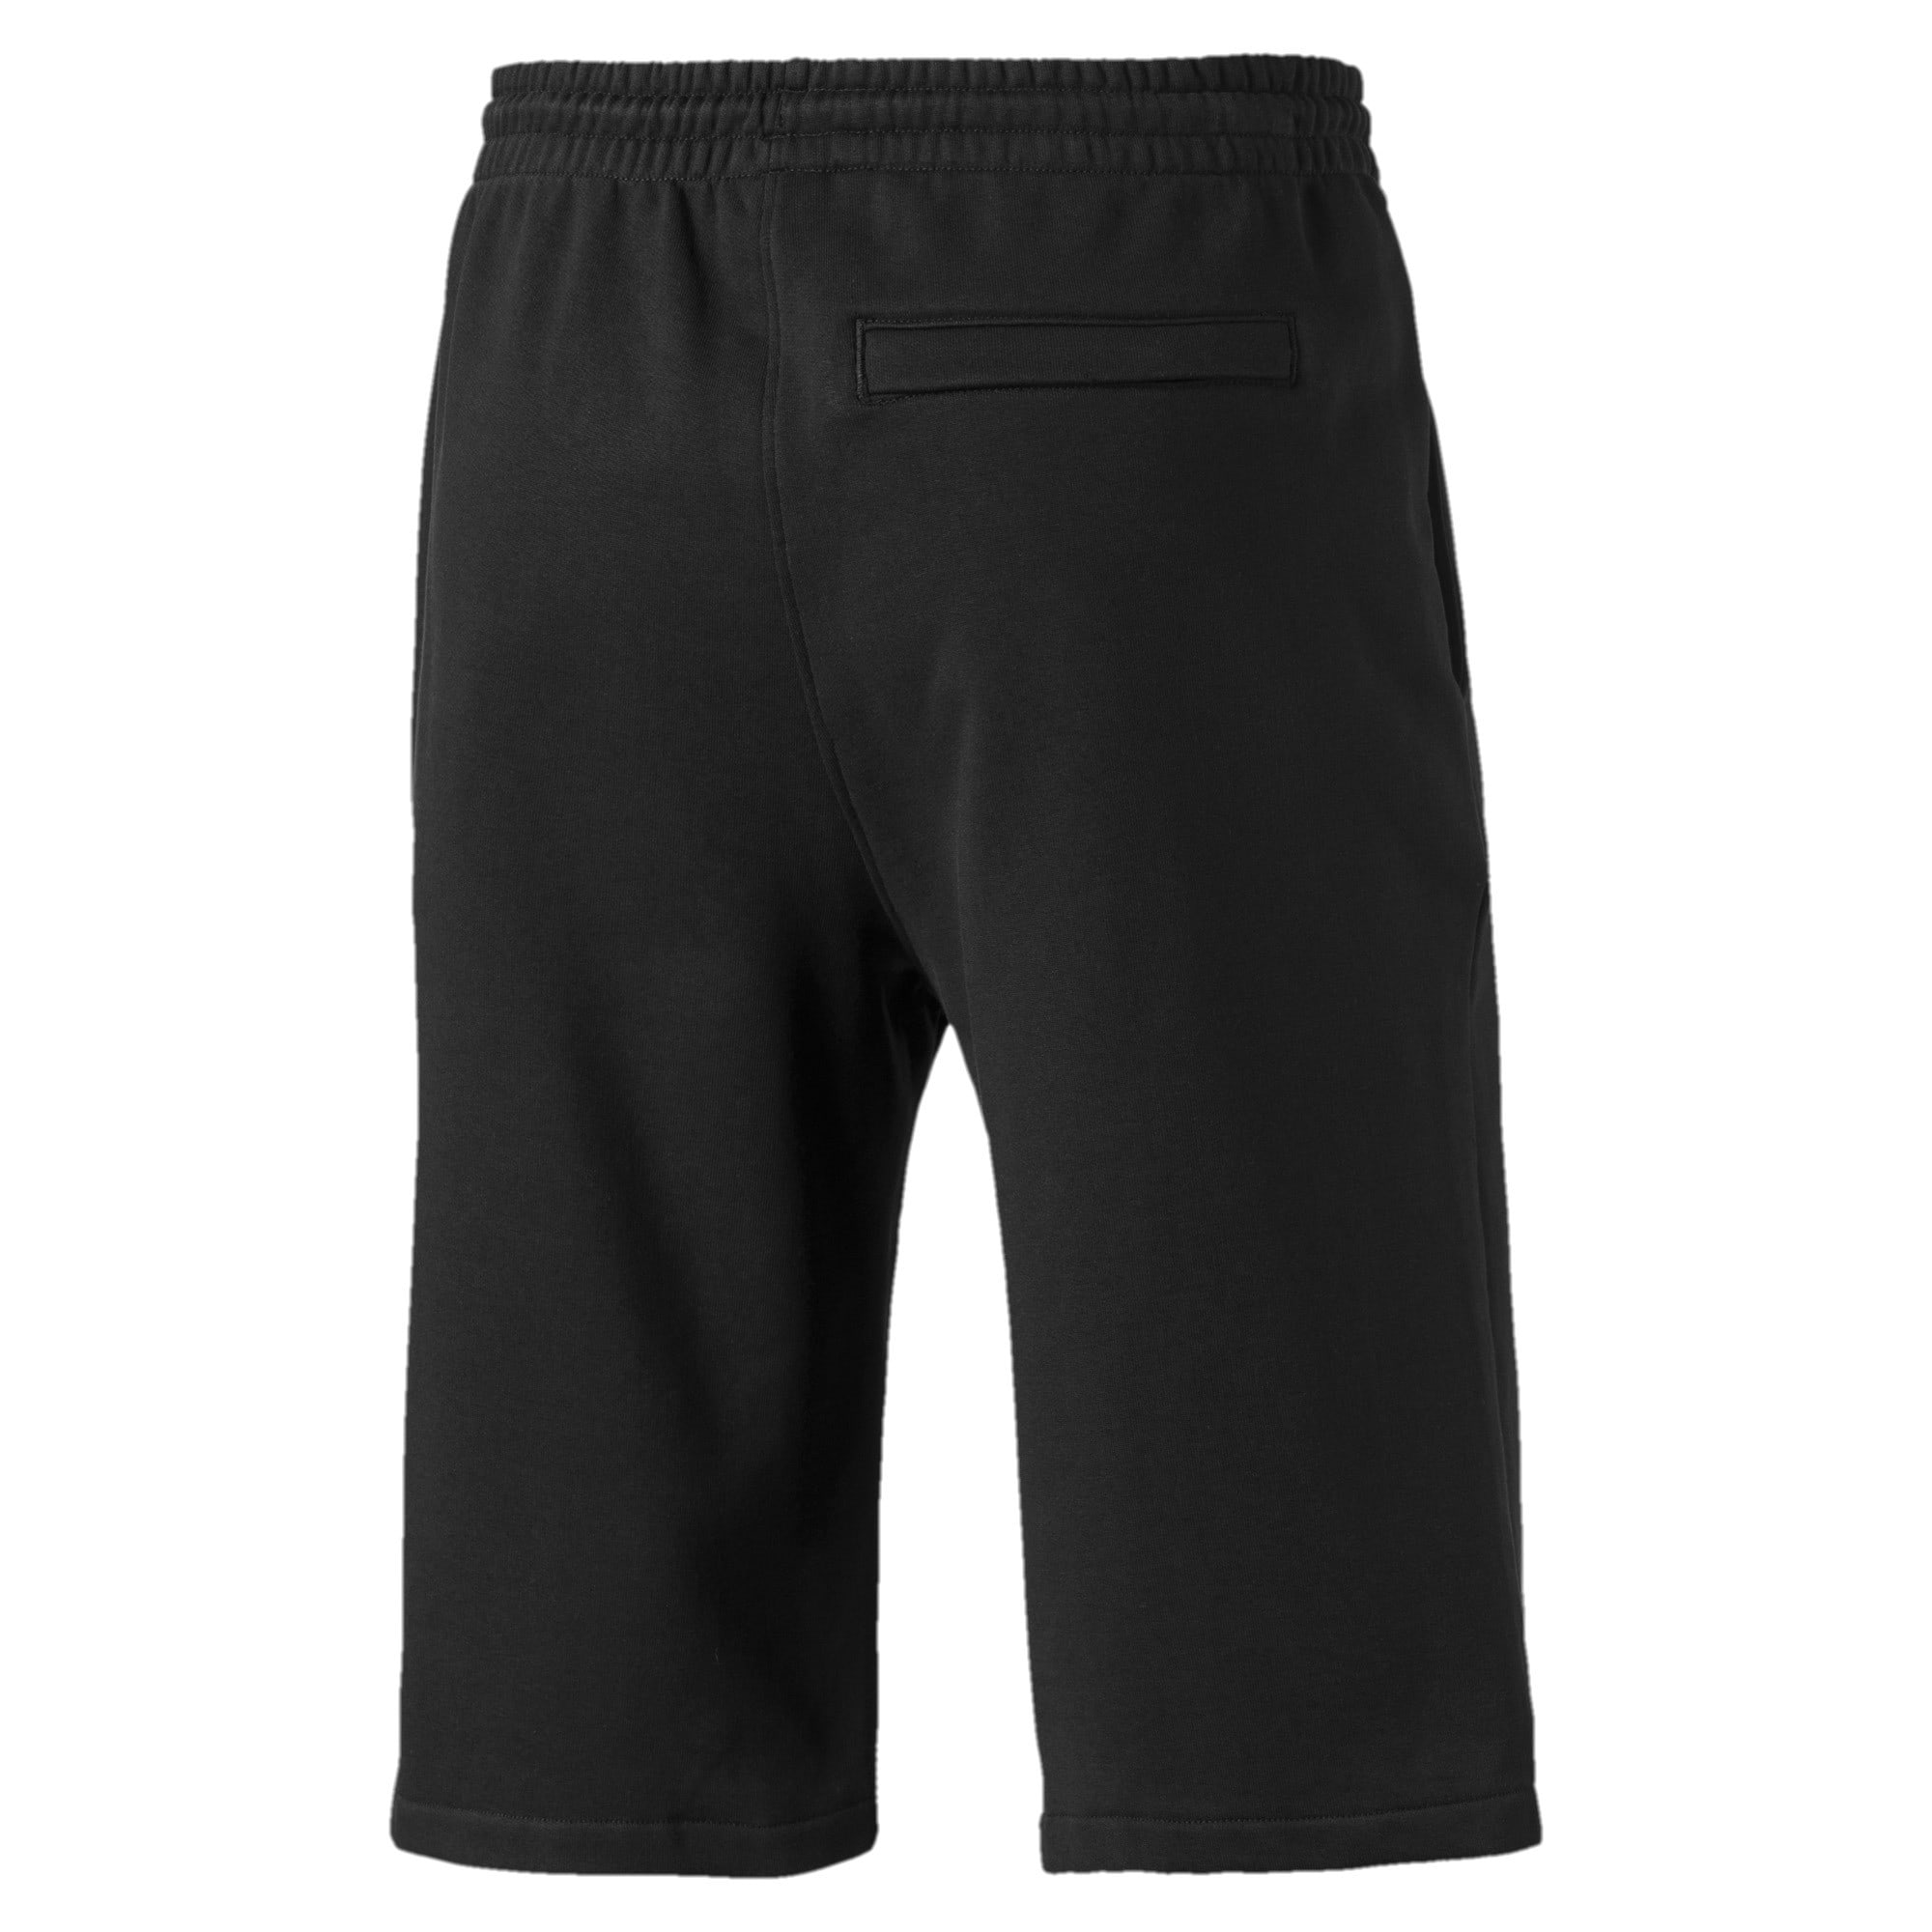 "Thumbnail 5 of Classics Logo 12"" Men's Shorts, Cotton Black, medium-IND"